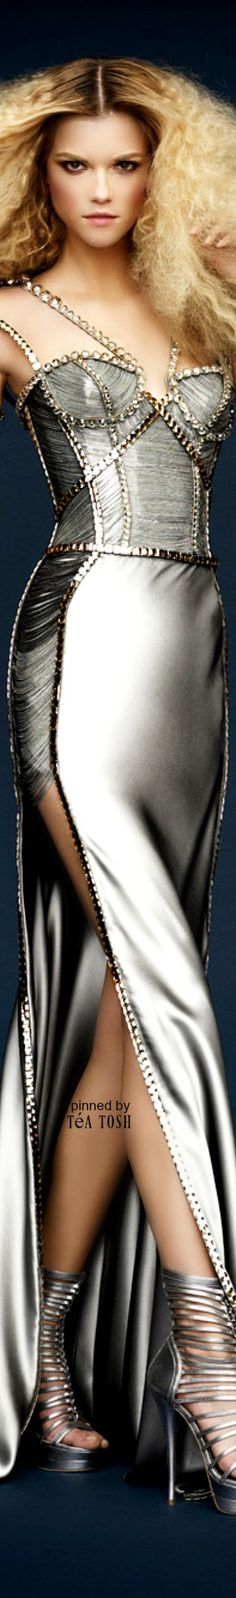 ❇︎Téa Tosh❇︎Atelier, Versace, Spring 2010                                                                                                                                                                                 More